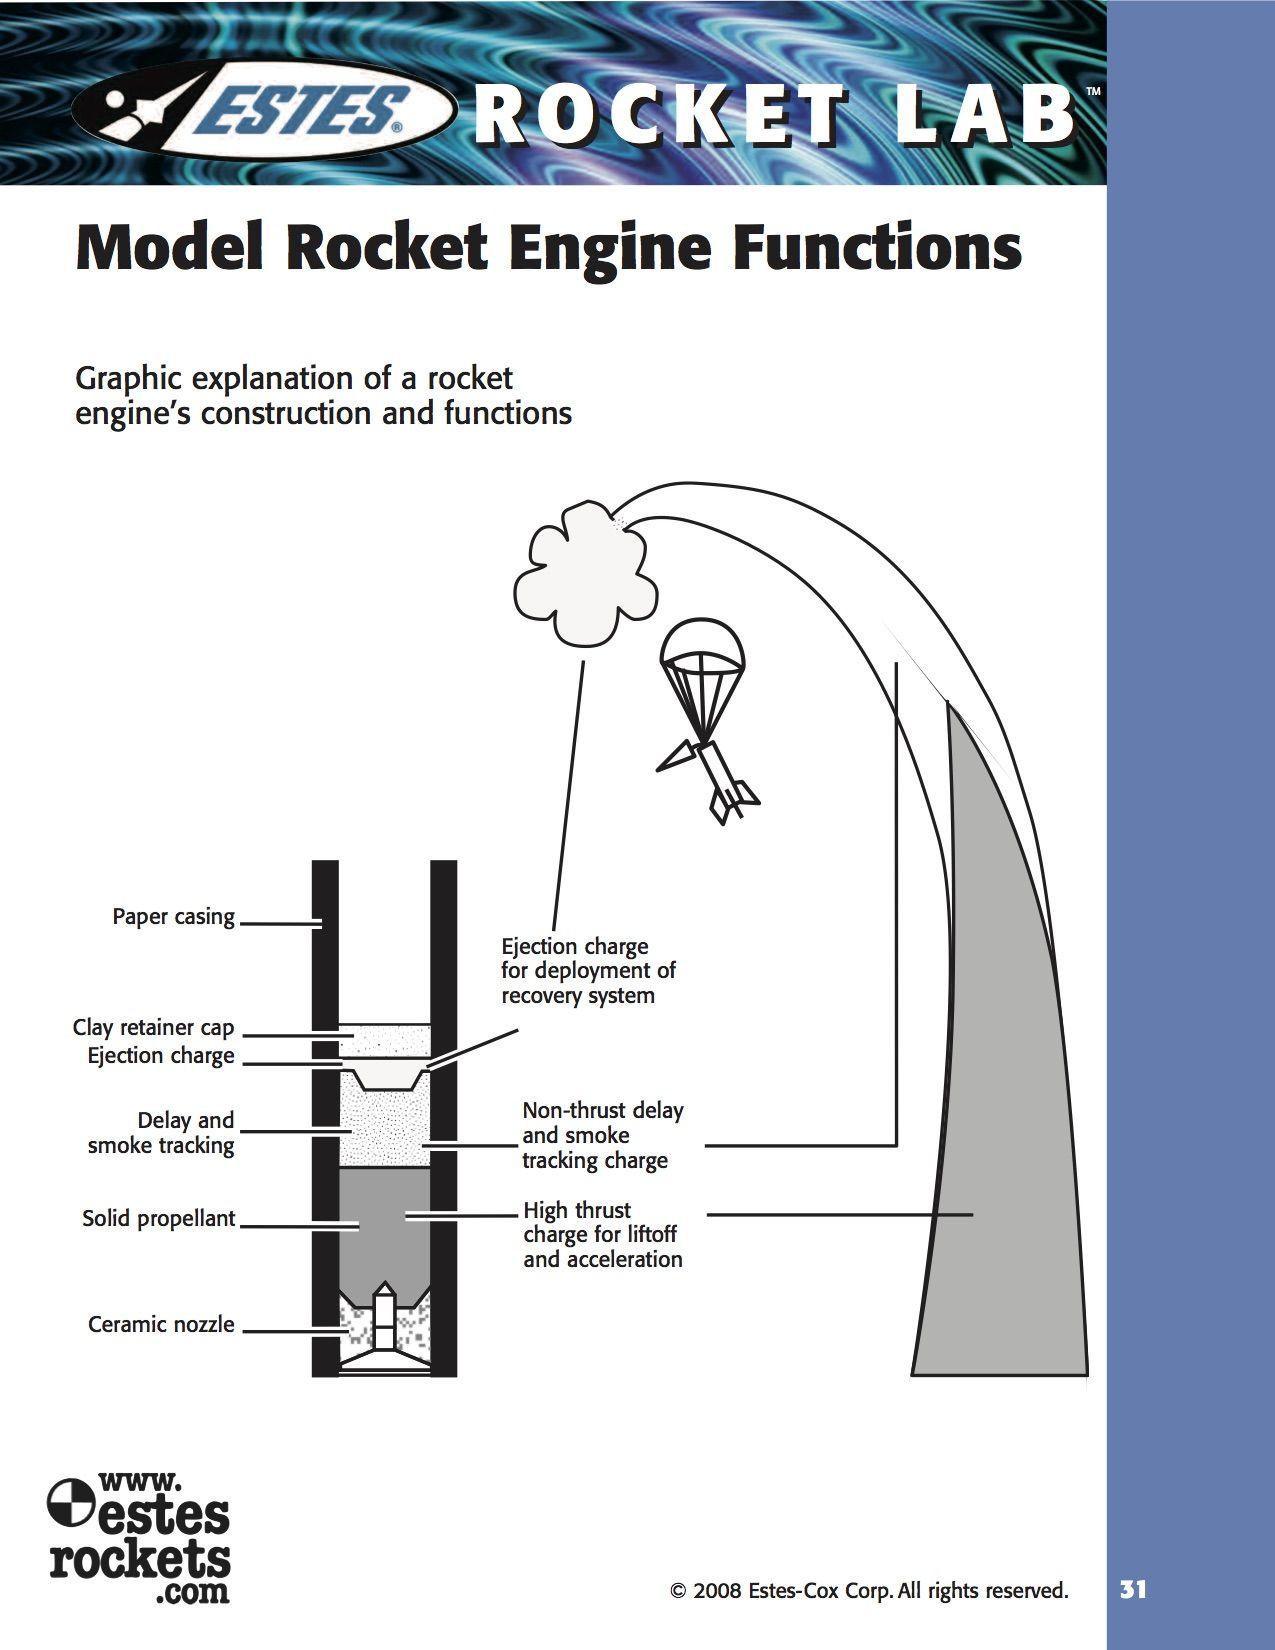 model rocket engine functions graphic explanation of a rocket engine s construction and functions  [ 1275 x 1650 Pixel ]